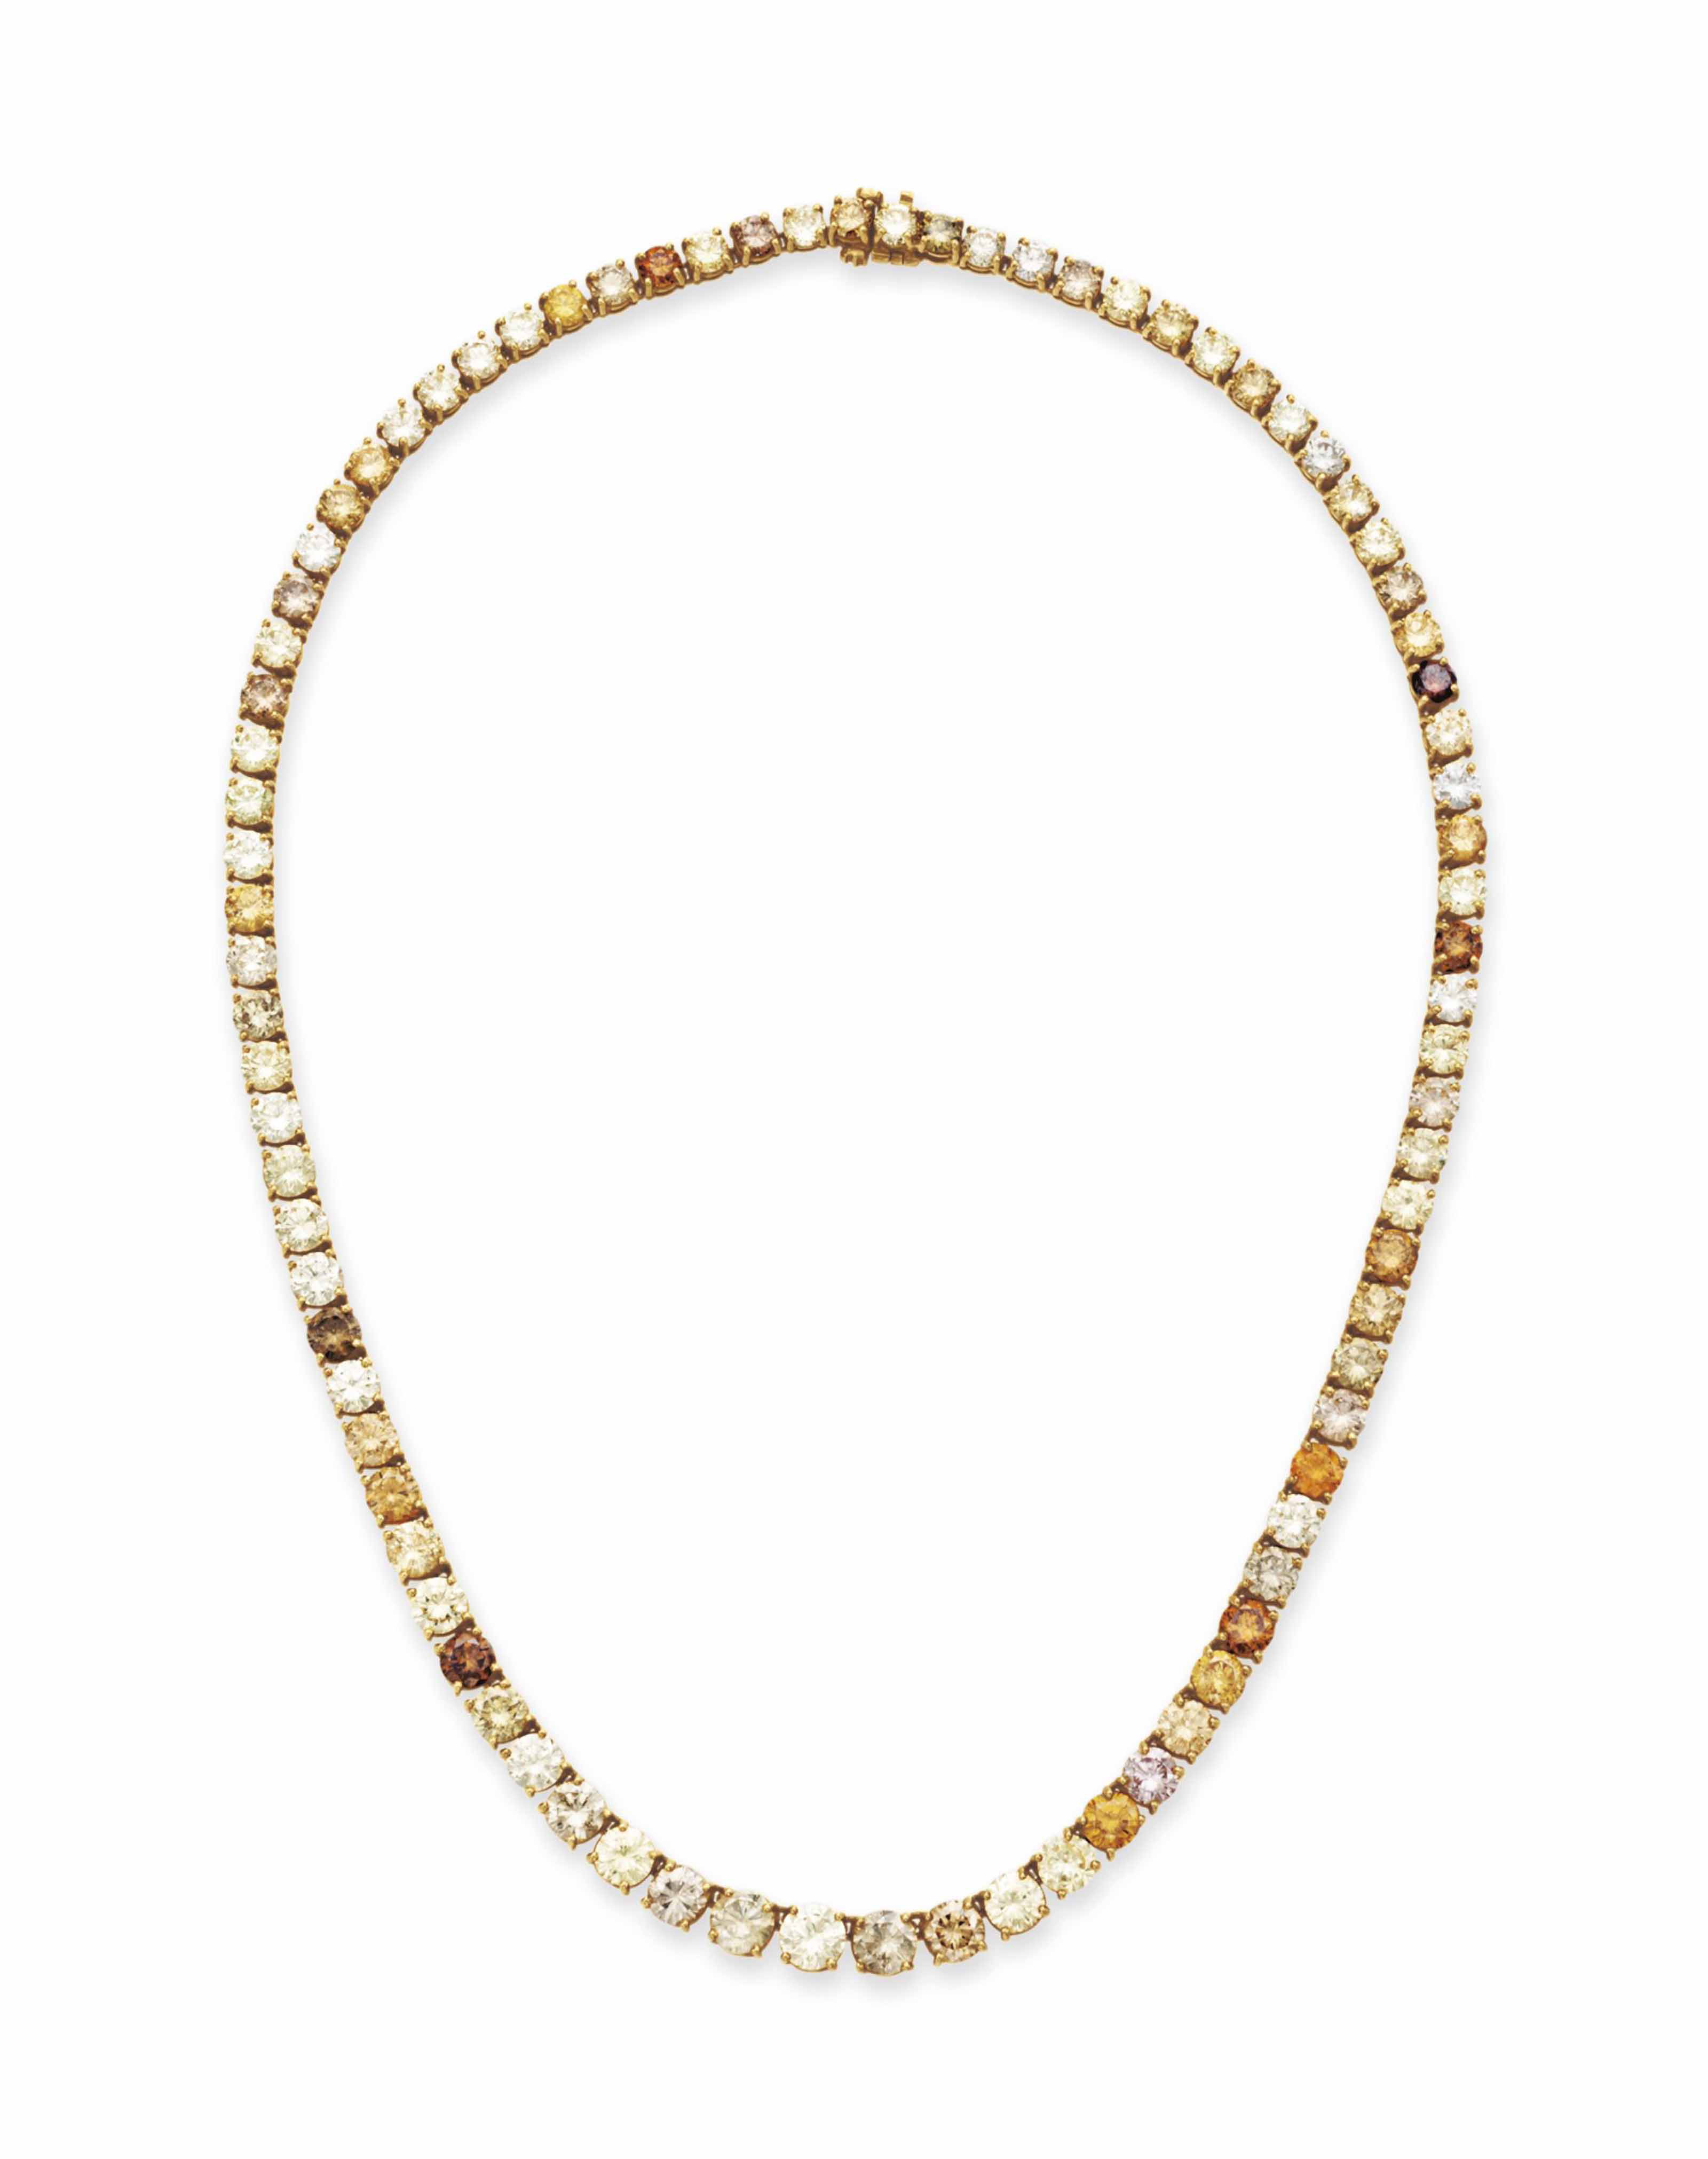 A COLORED DIAMOND LINE NECKLAC